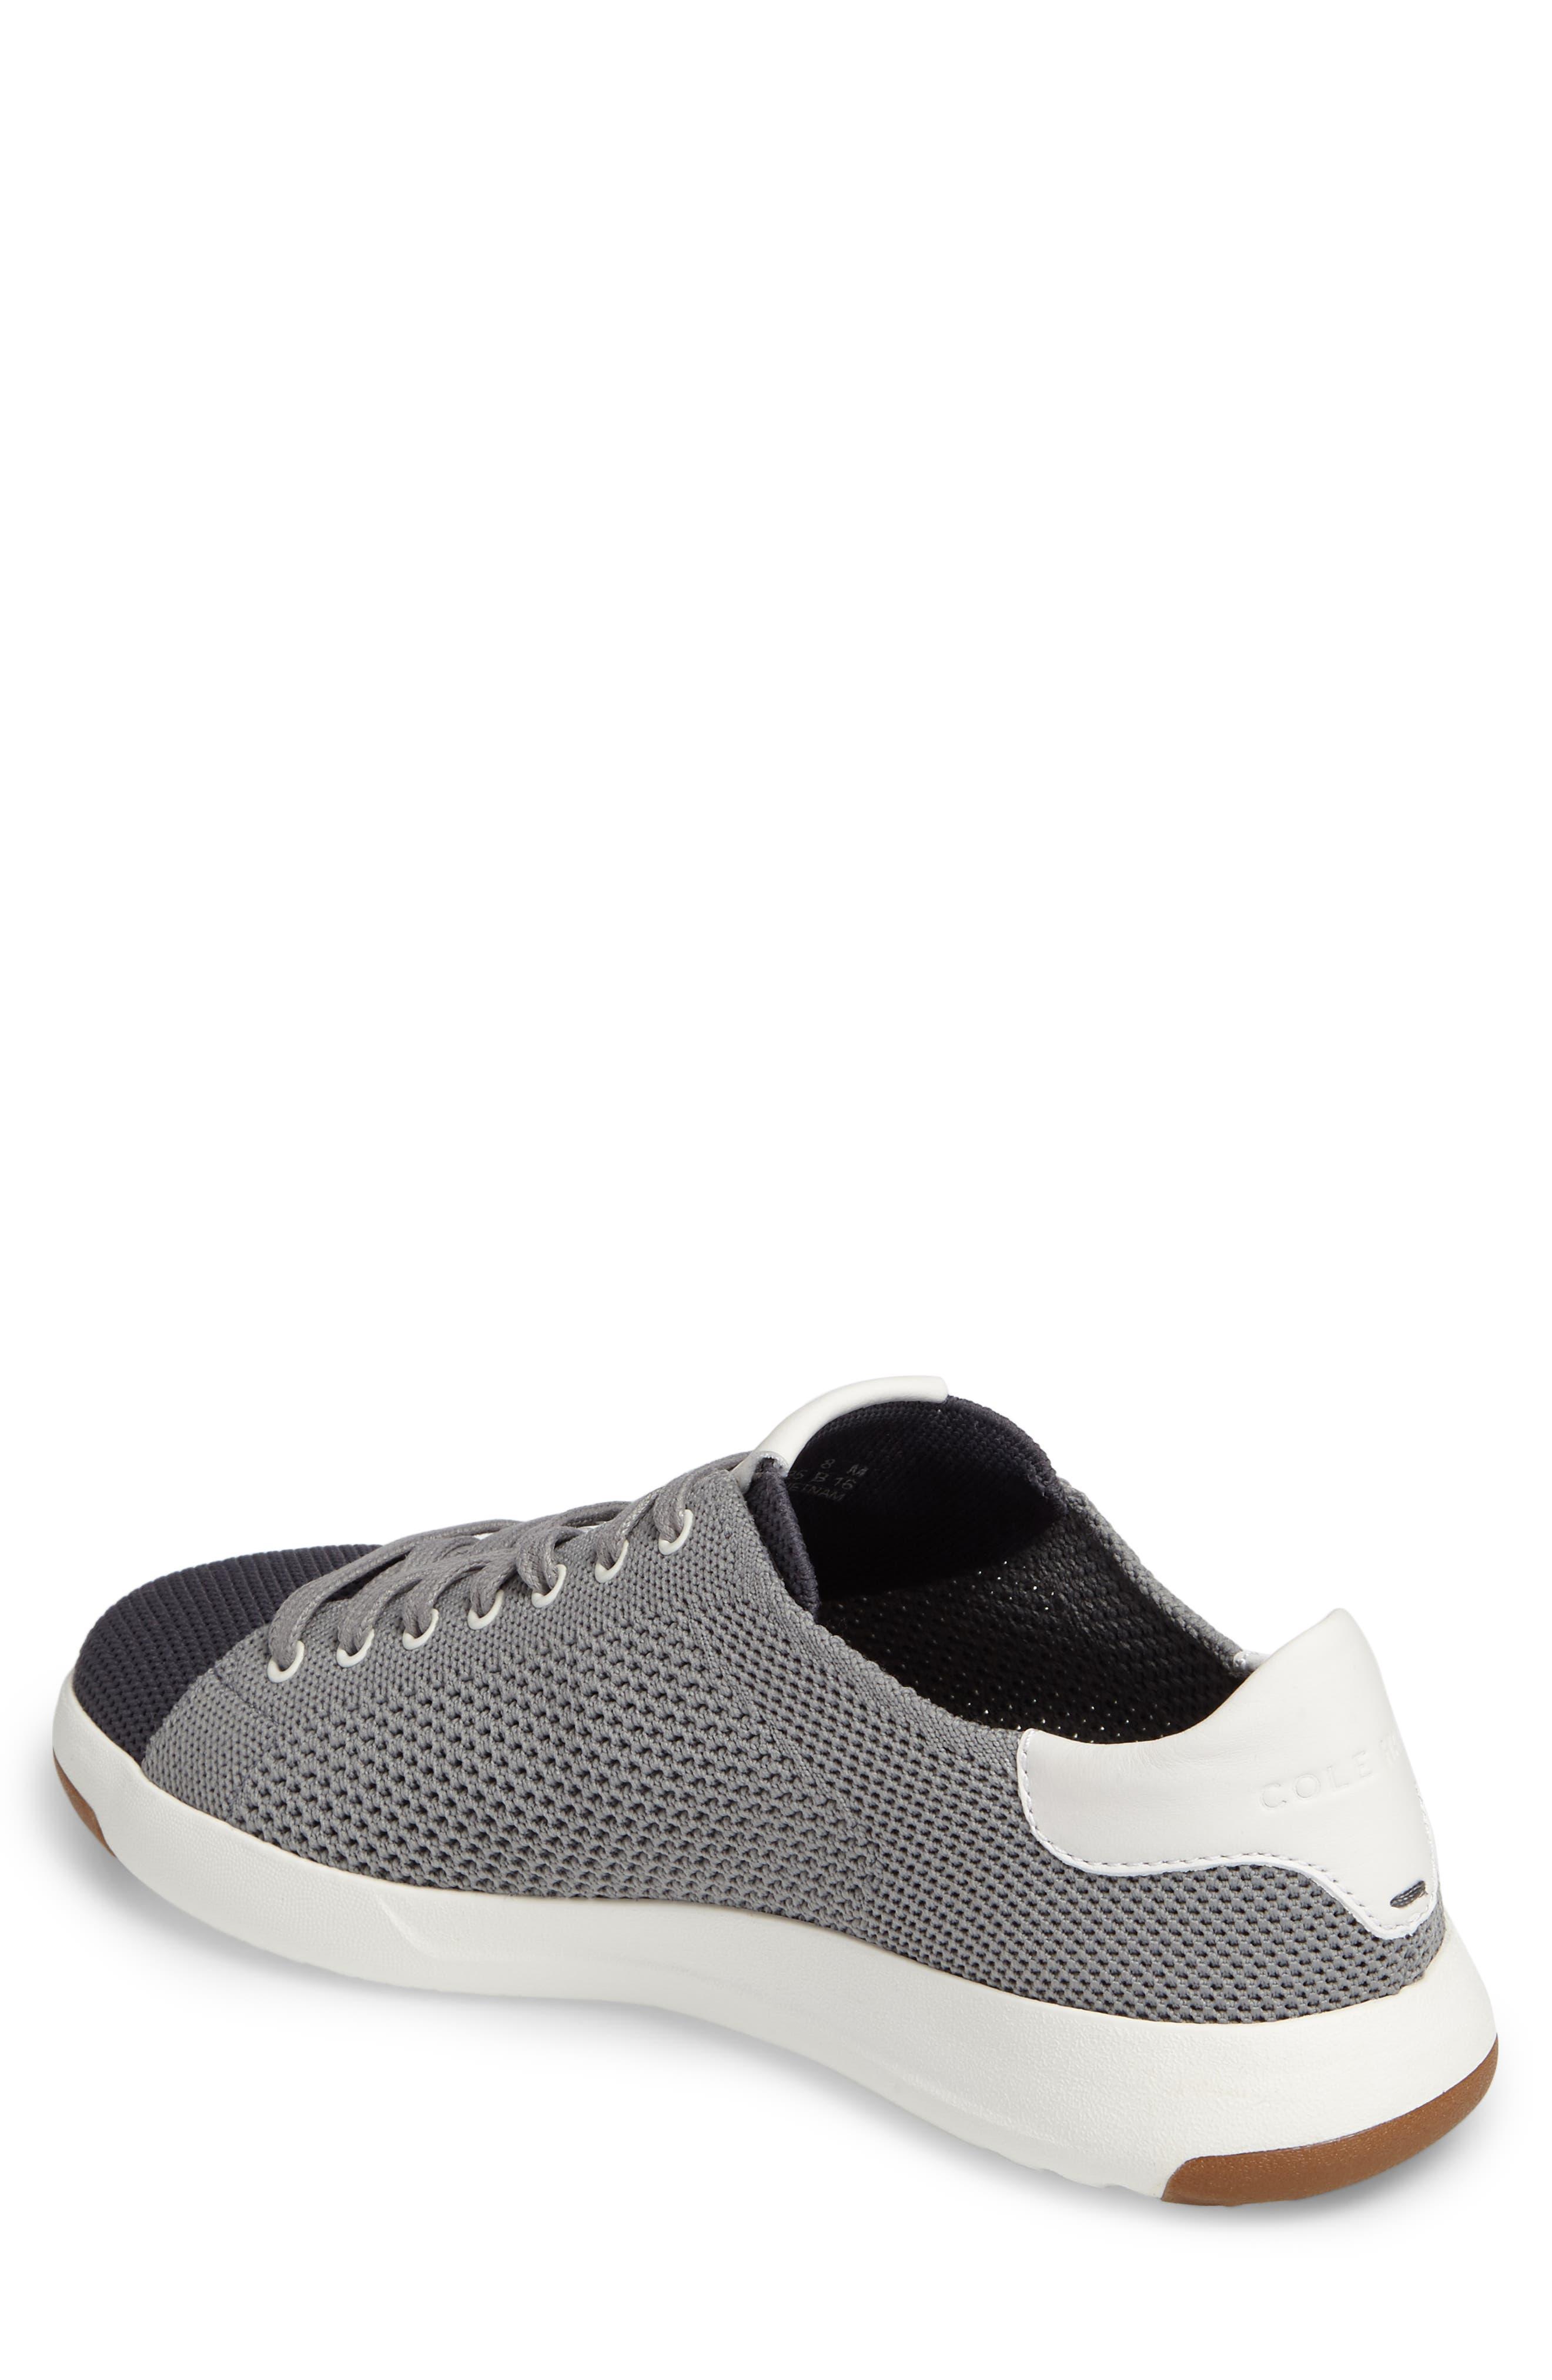 GrandPrø Stitchlite Tennis Sneaker,                             Alternate thumbnail 2, color,                             Magnet Grey Fabric